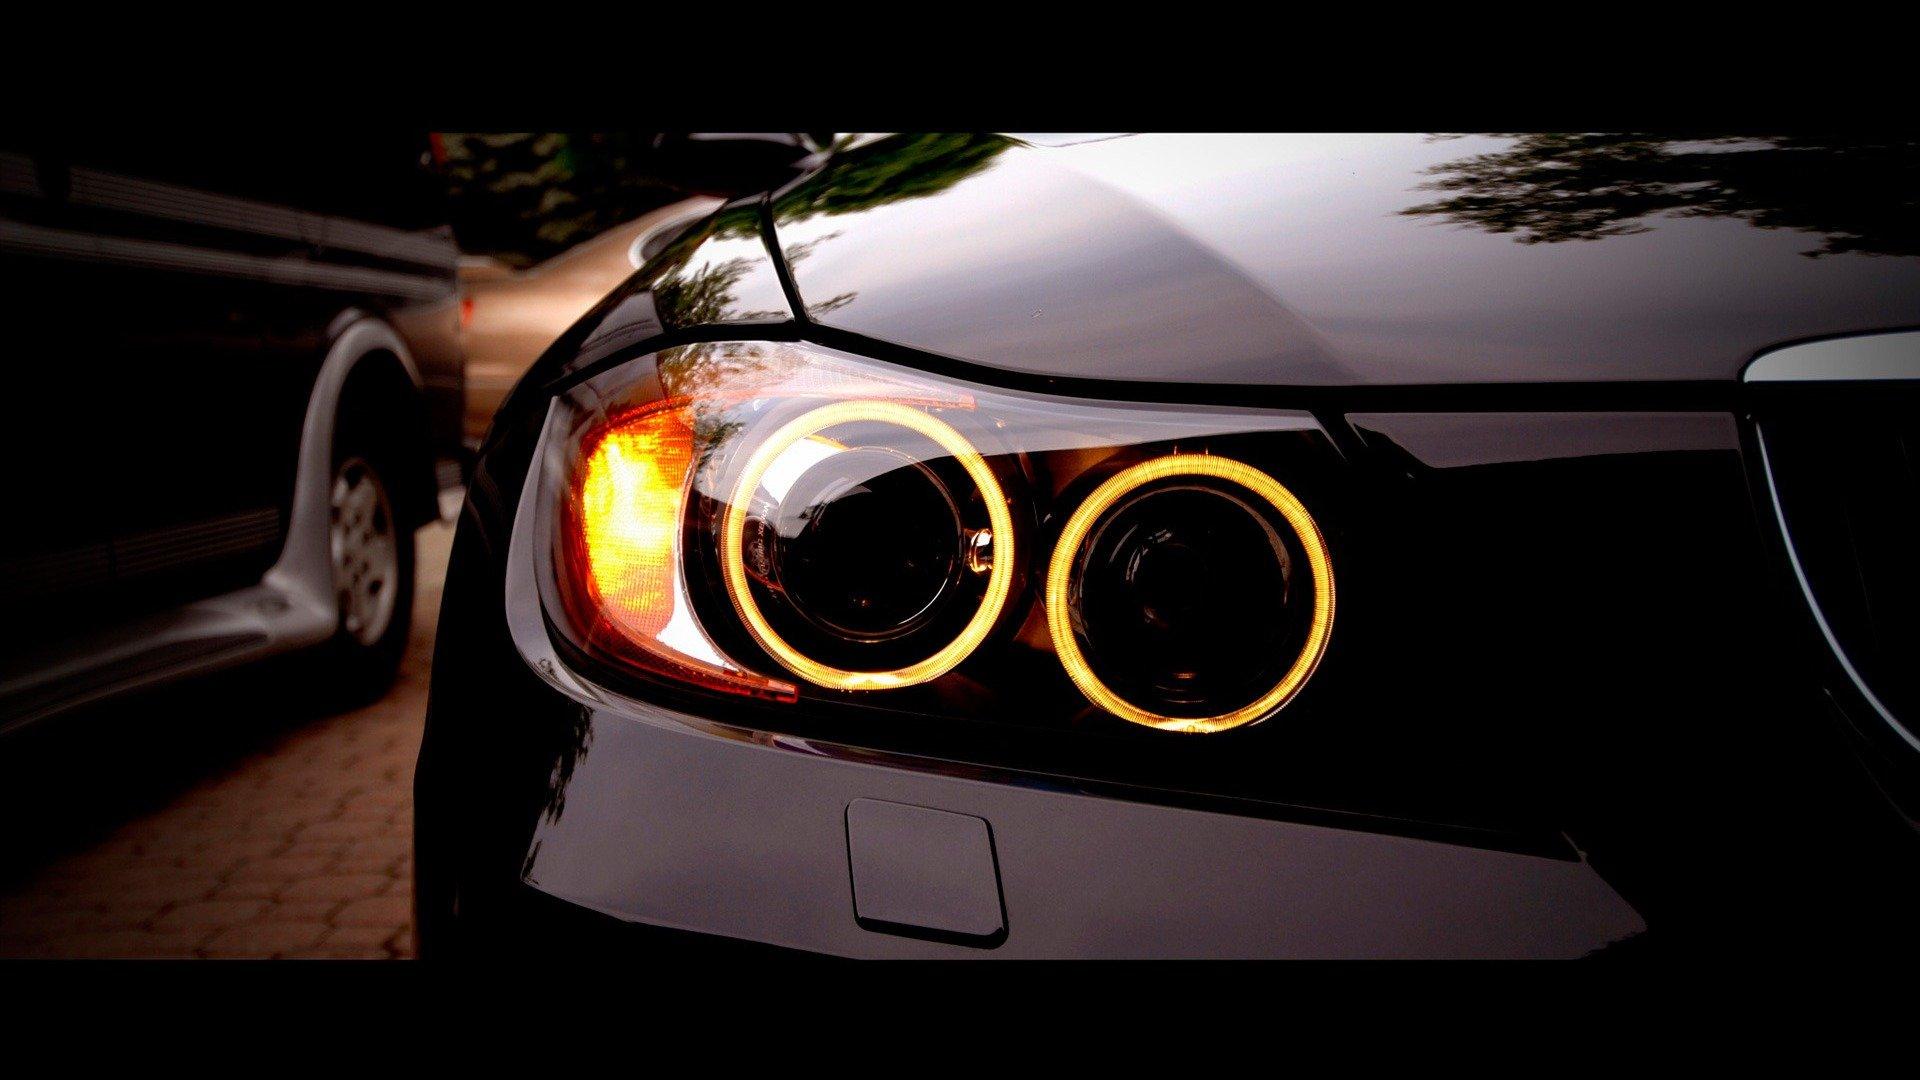 Car wallpapers: Black BMW headlight | Car Humor